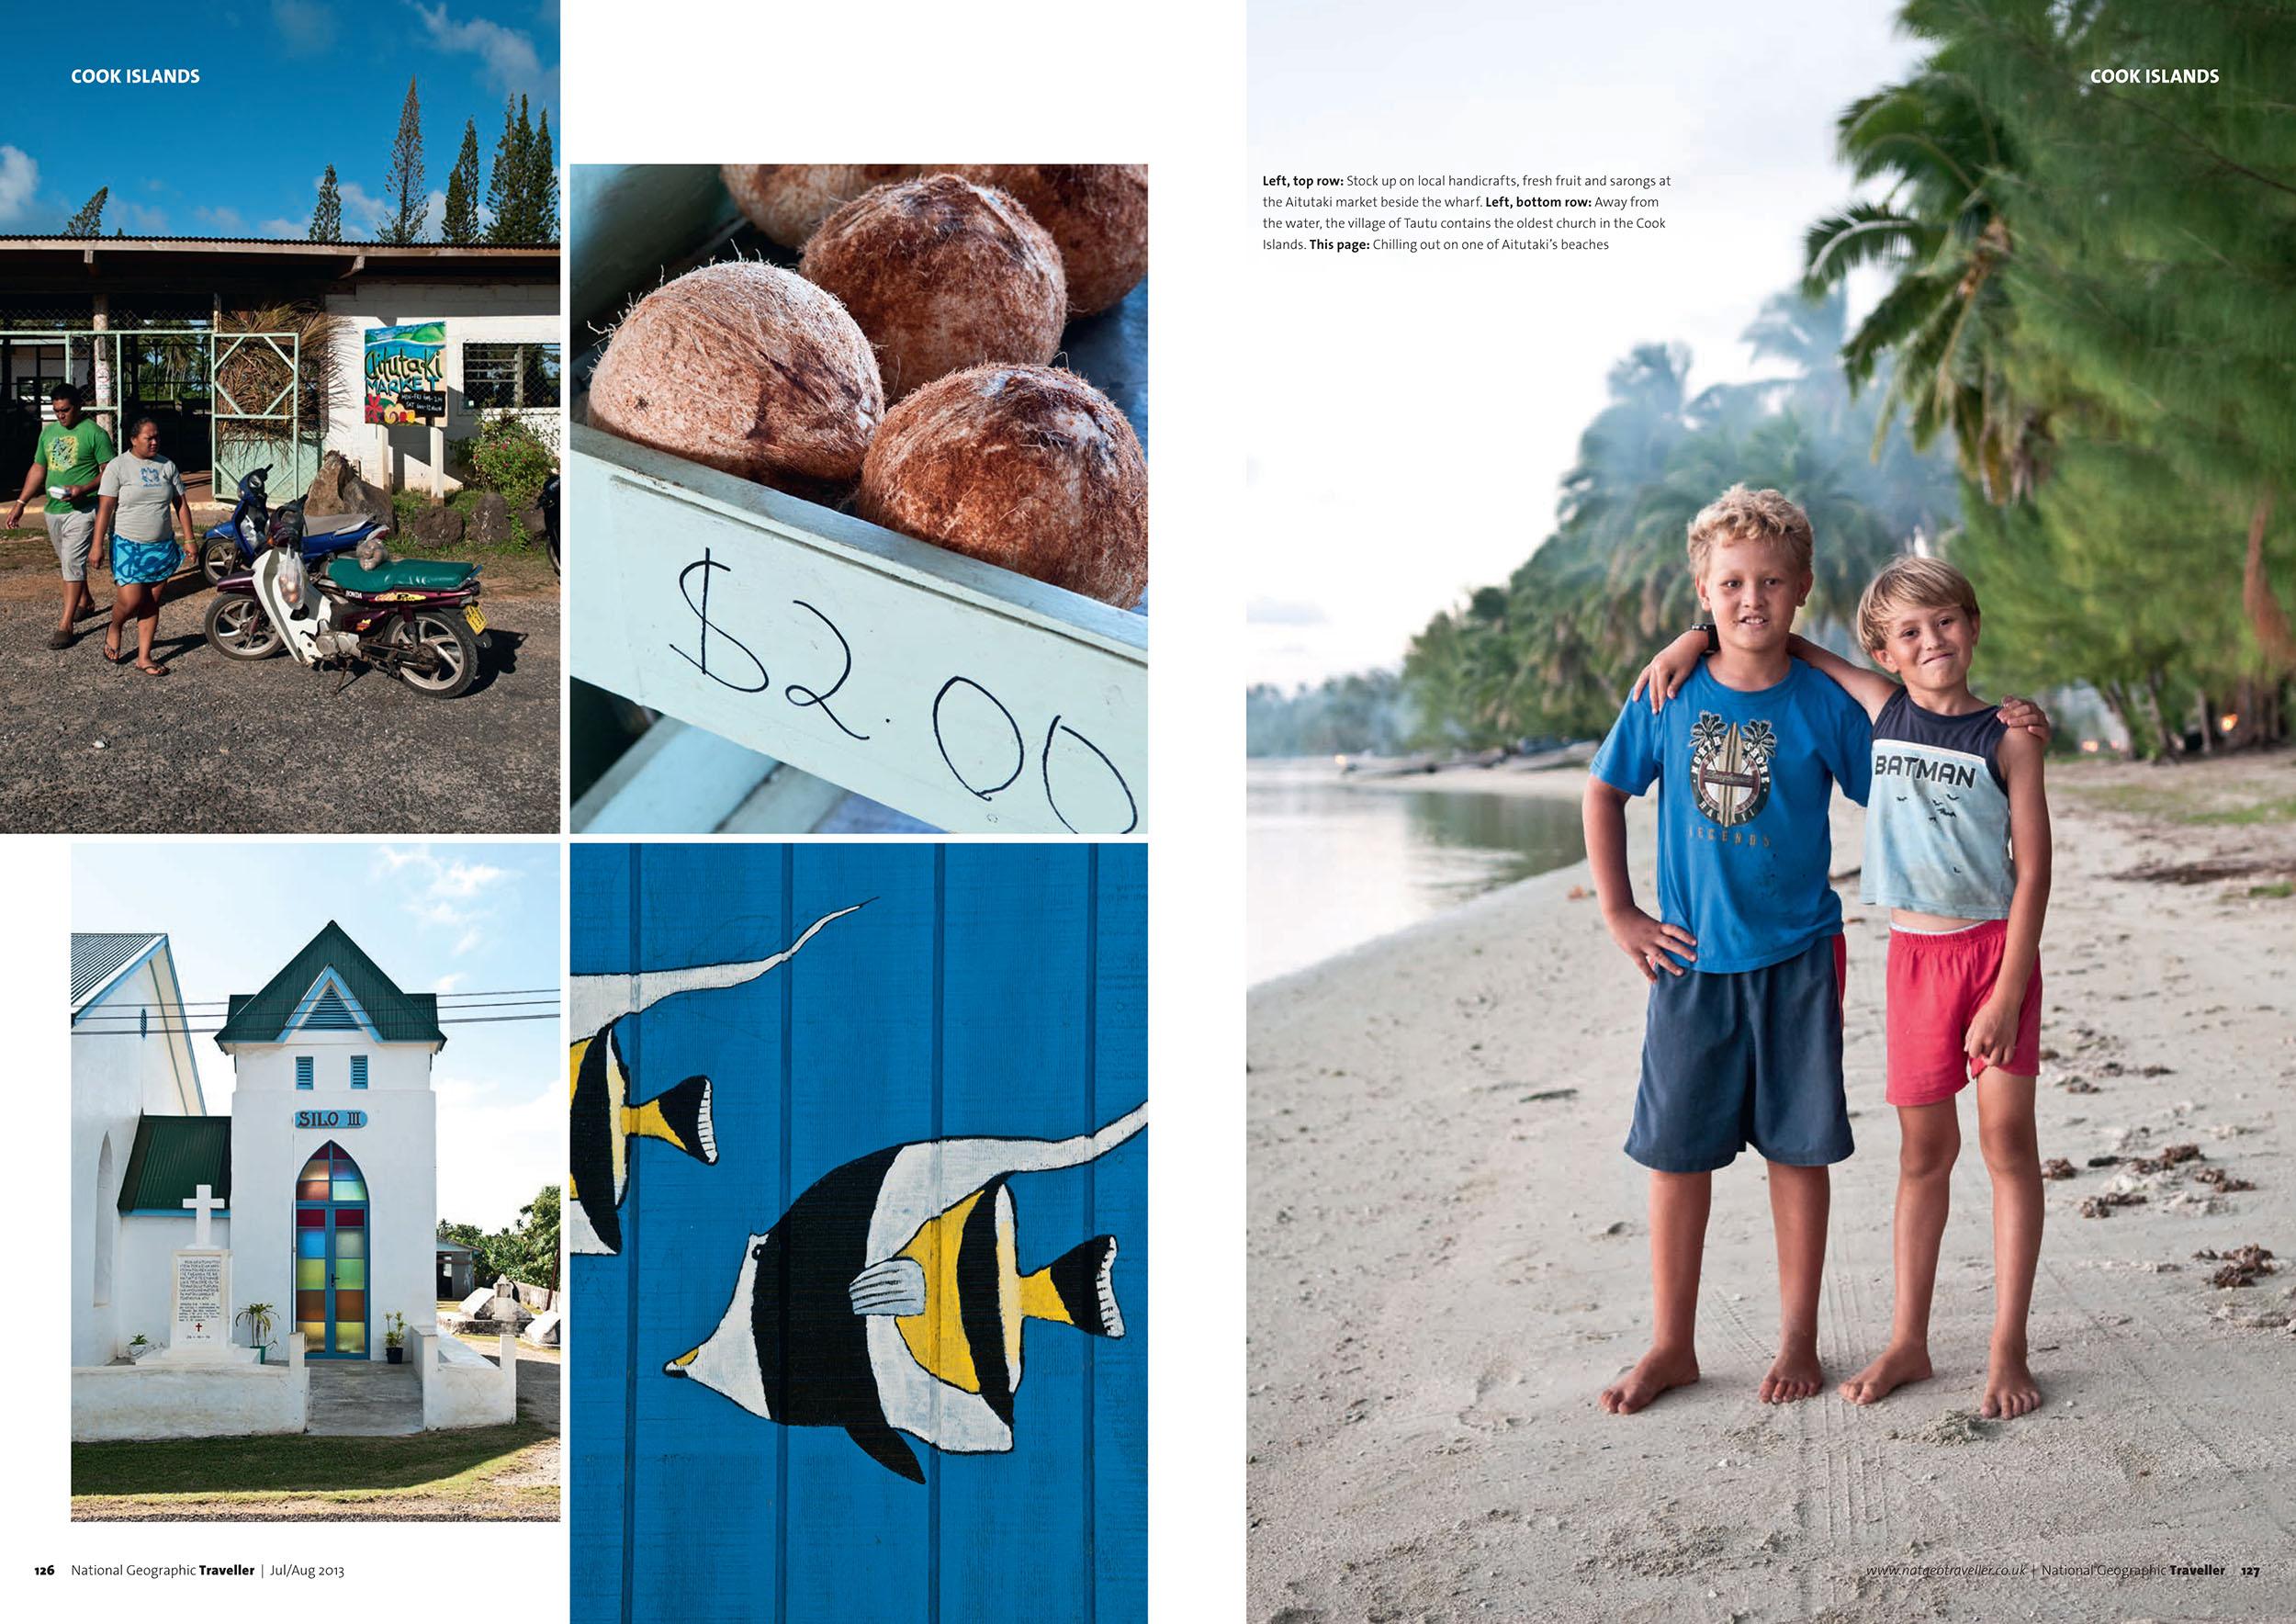 Pickard_20130701_National_Geographic_Traveller_Aitutaki_Island_002.jpg